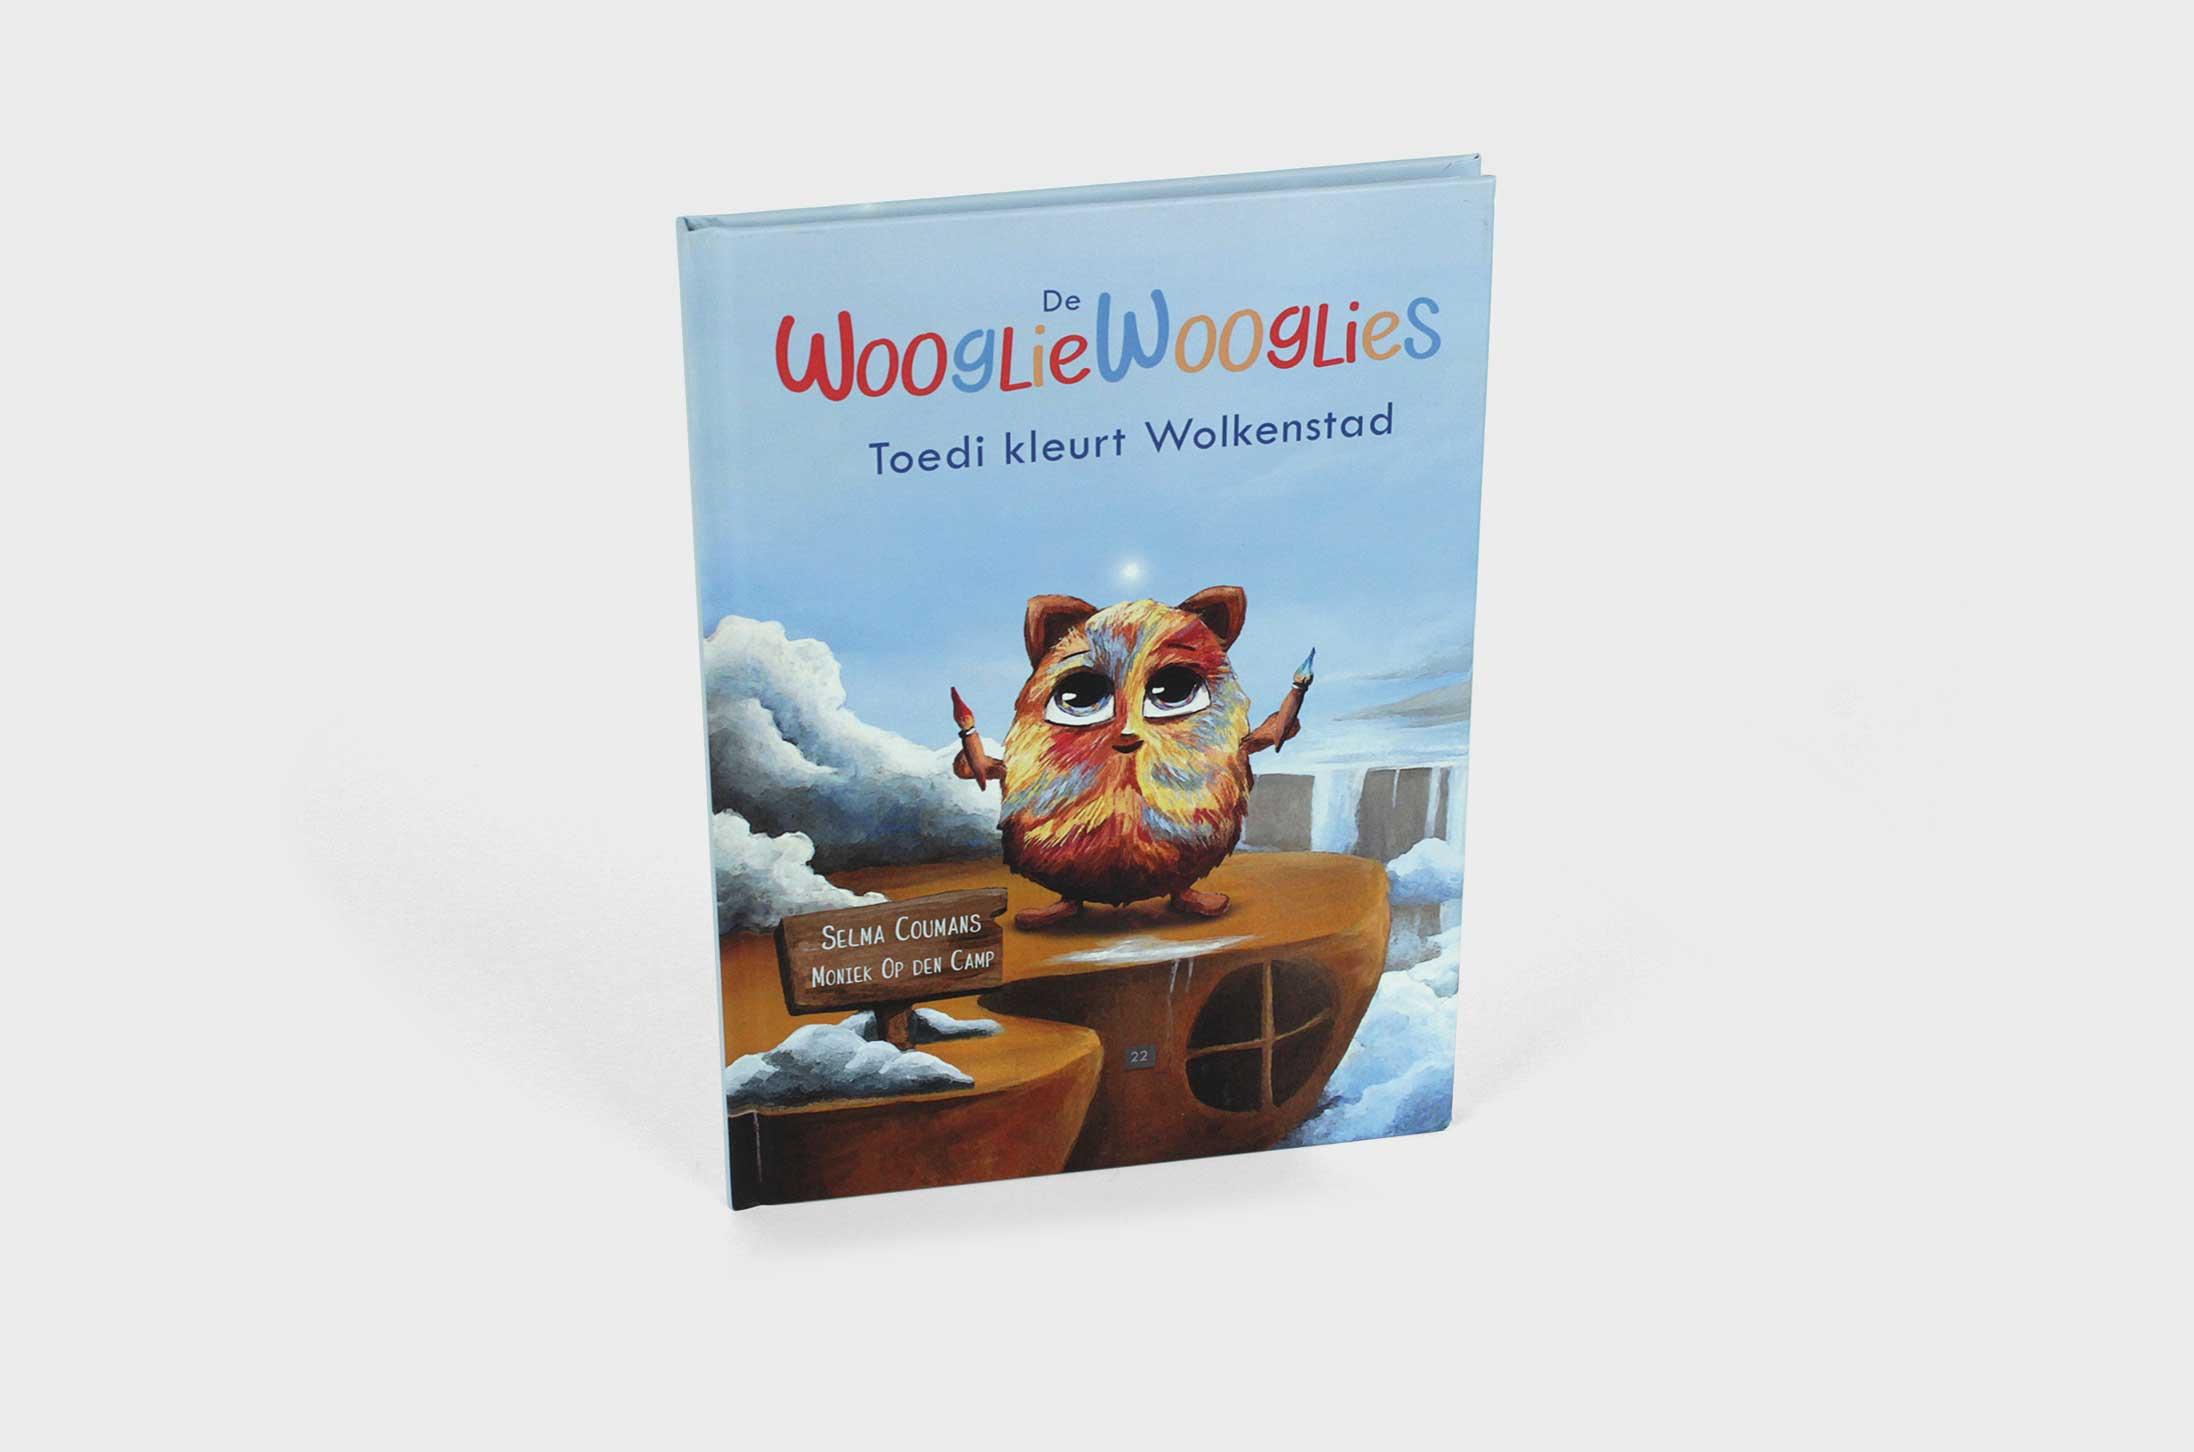 De WooglieWooglies, Toedi kleurt wolkenstad